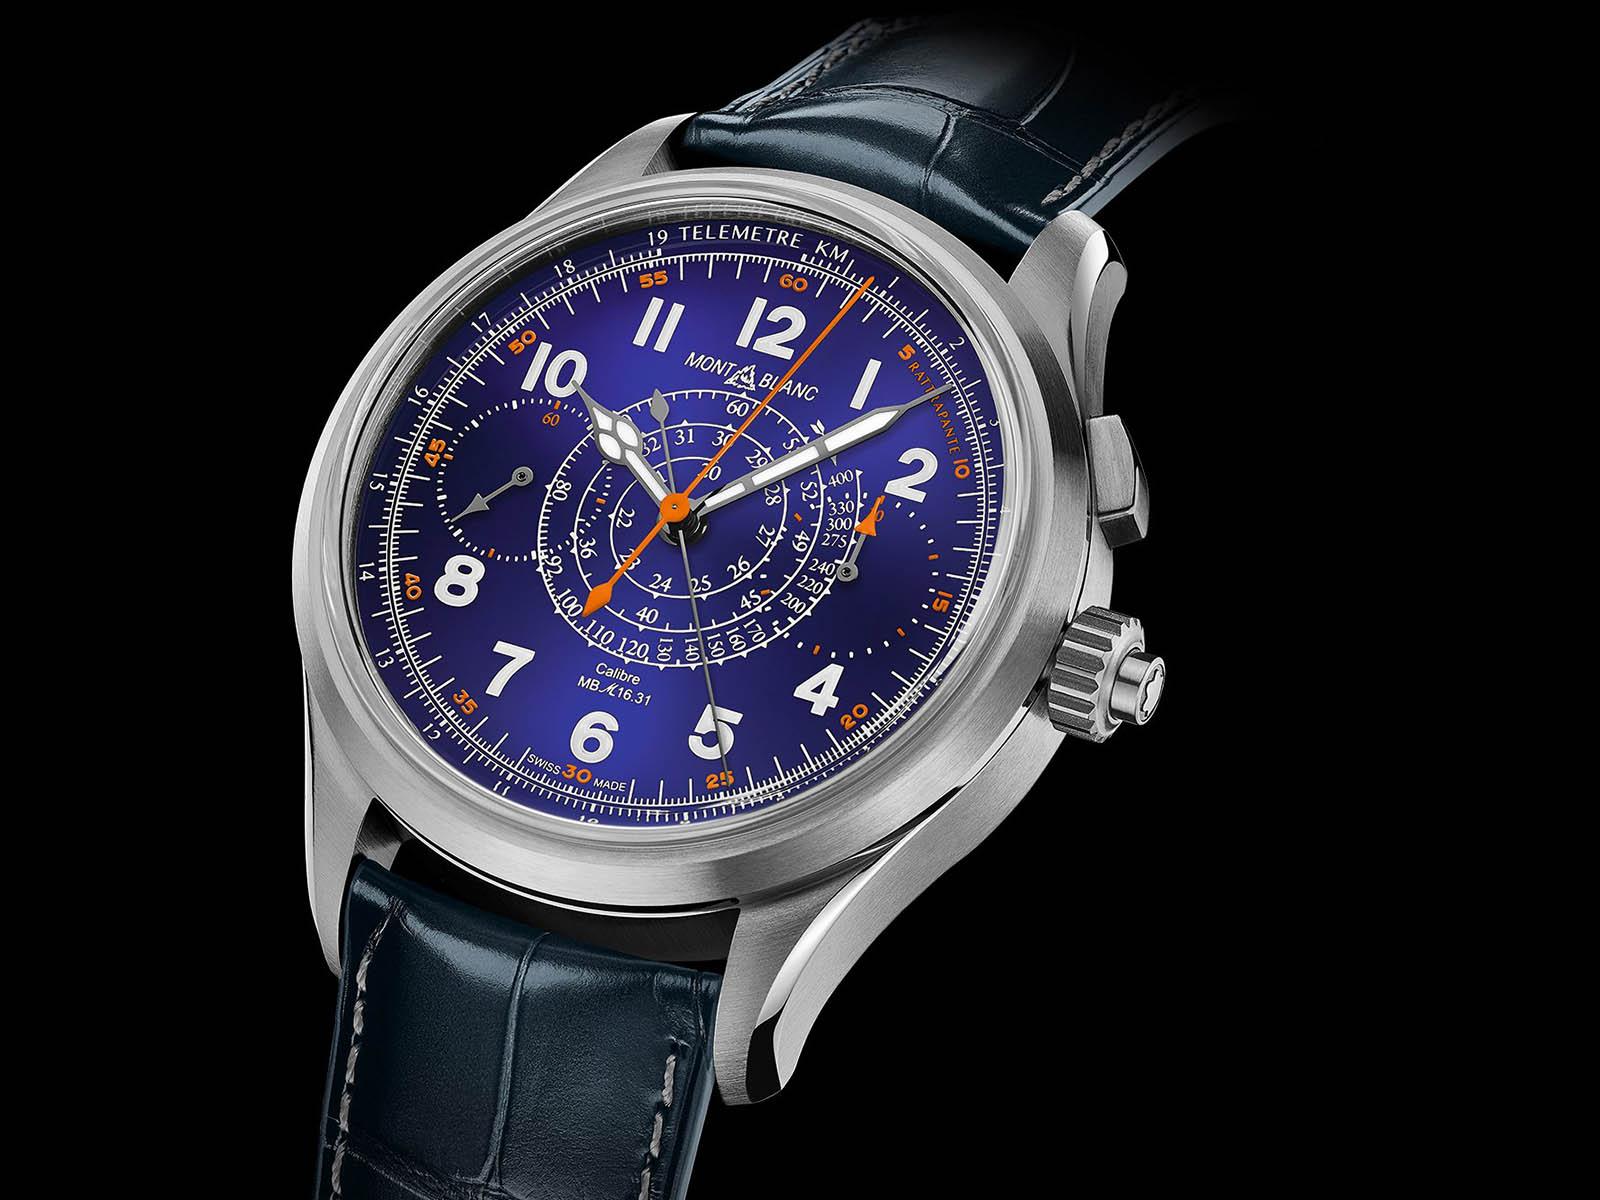 126006-montblanc-1858-split-second-chronograph-1.jpg